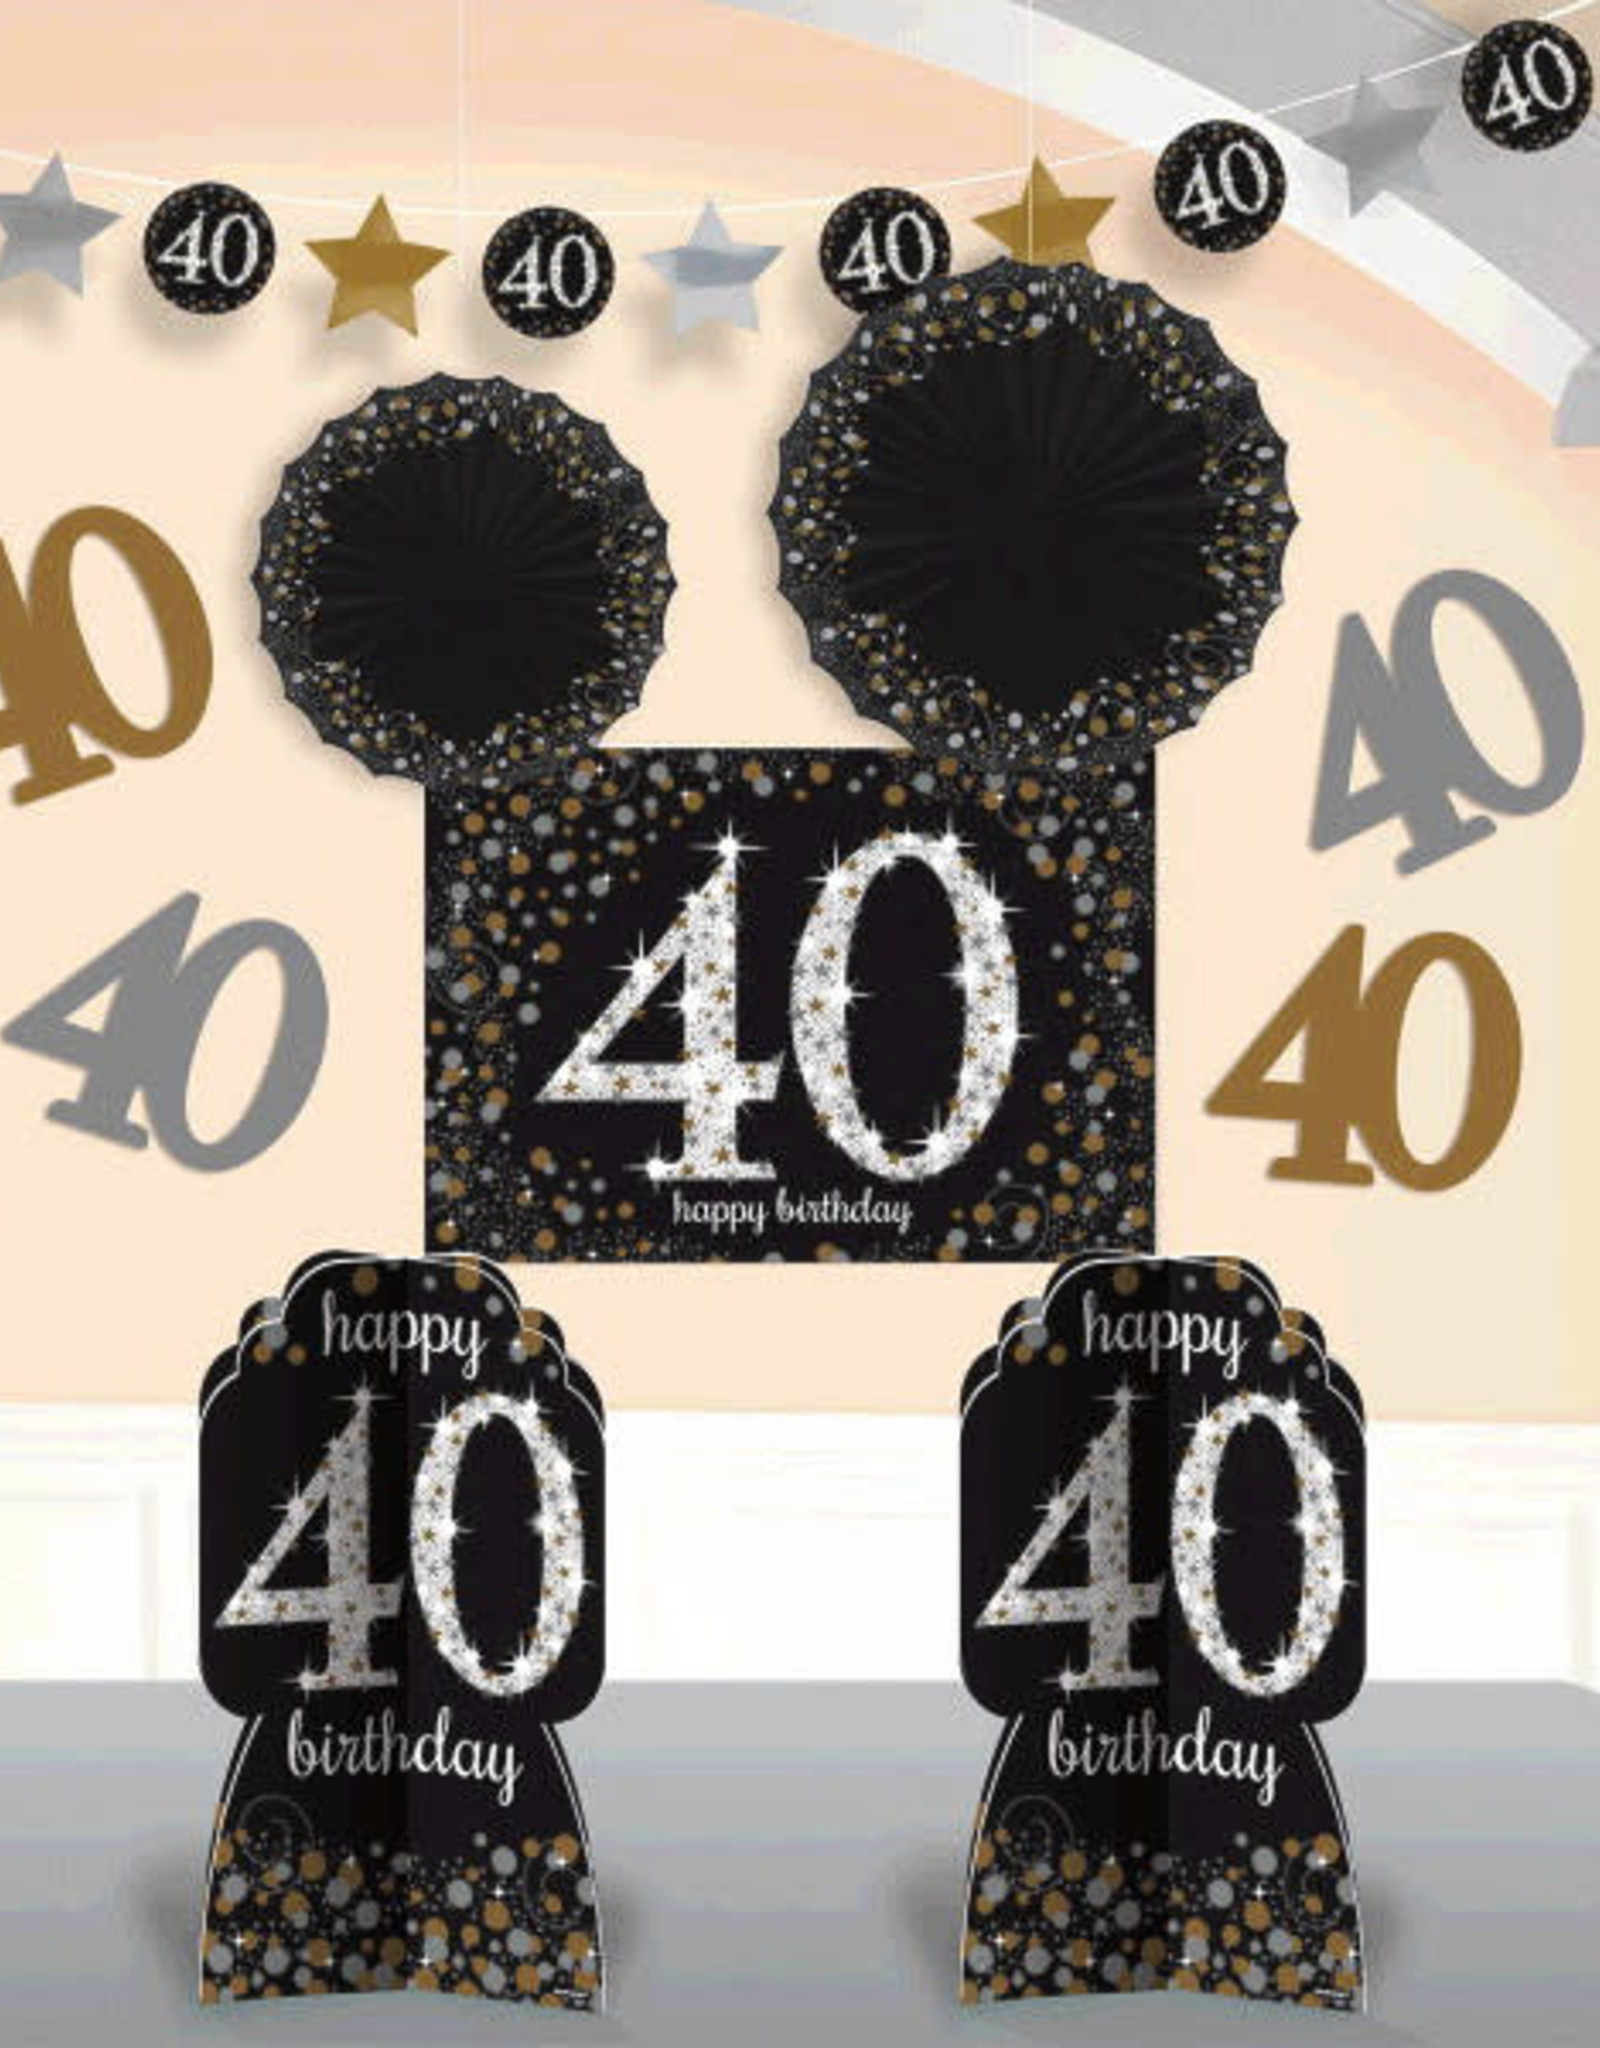 40th Birthday Black & Gold Sparkling Celebration Room Decorating Kit